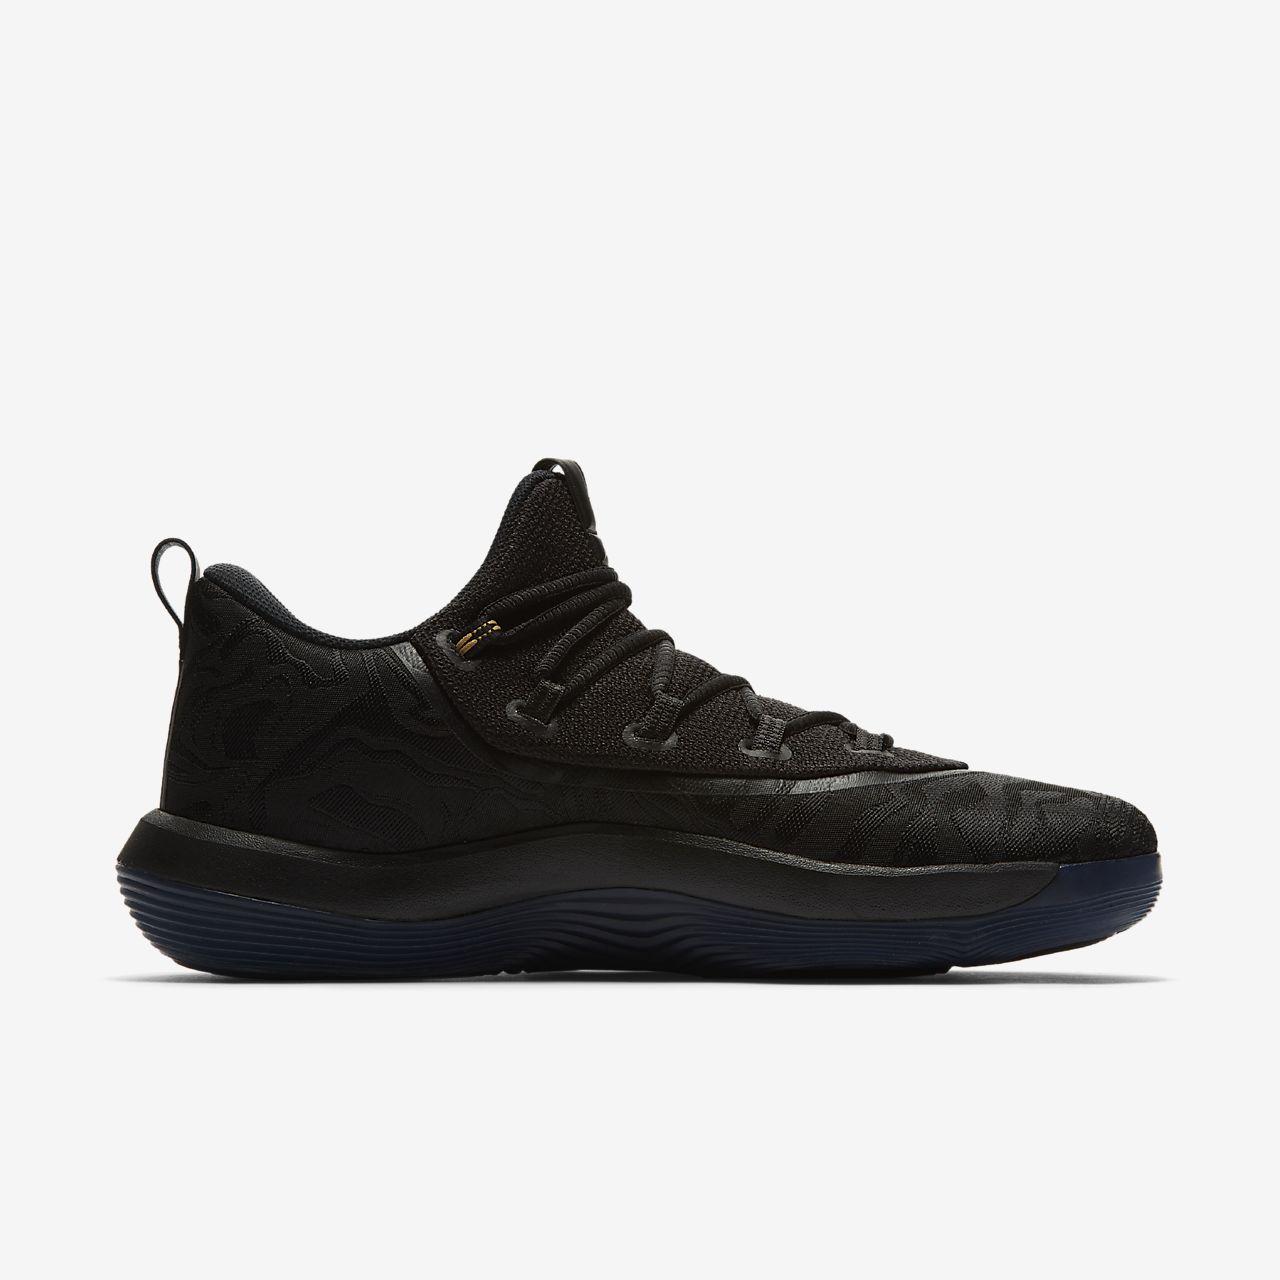 Chaussures De Basket-ball Hommes Nike Jordan Super.fly 2017 xSJmR